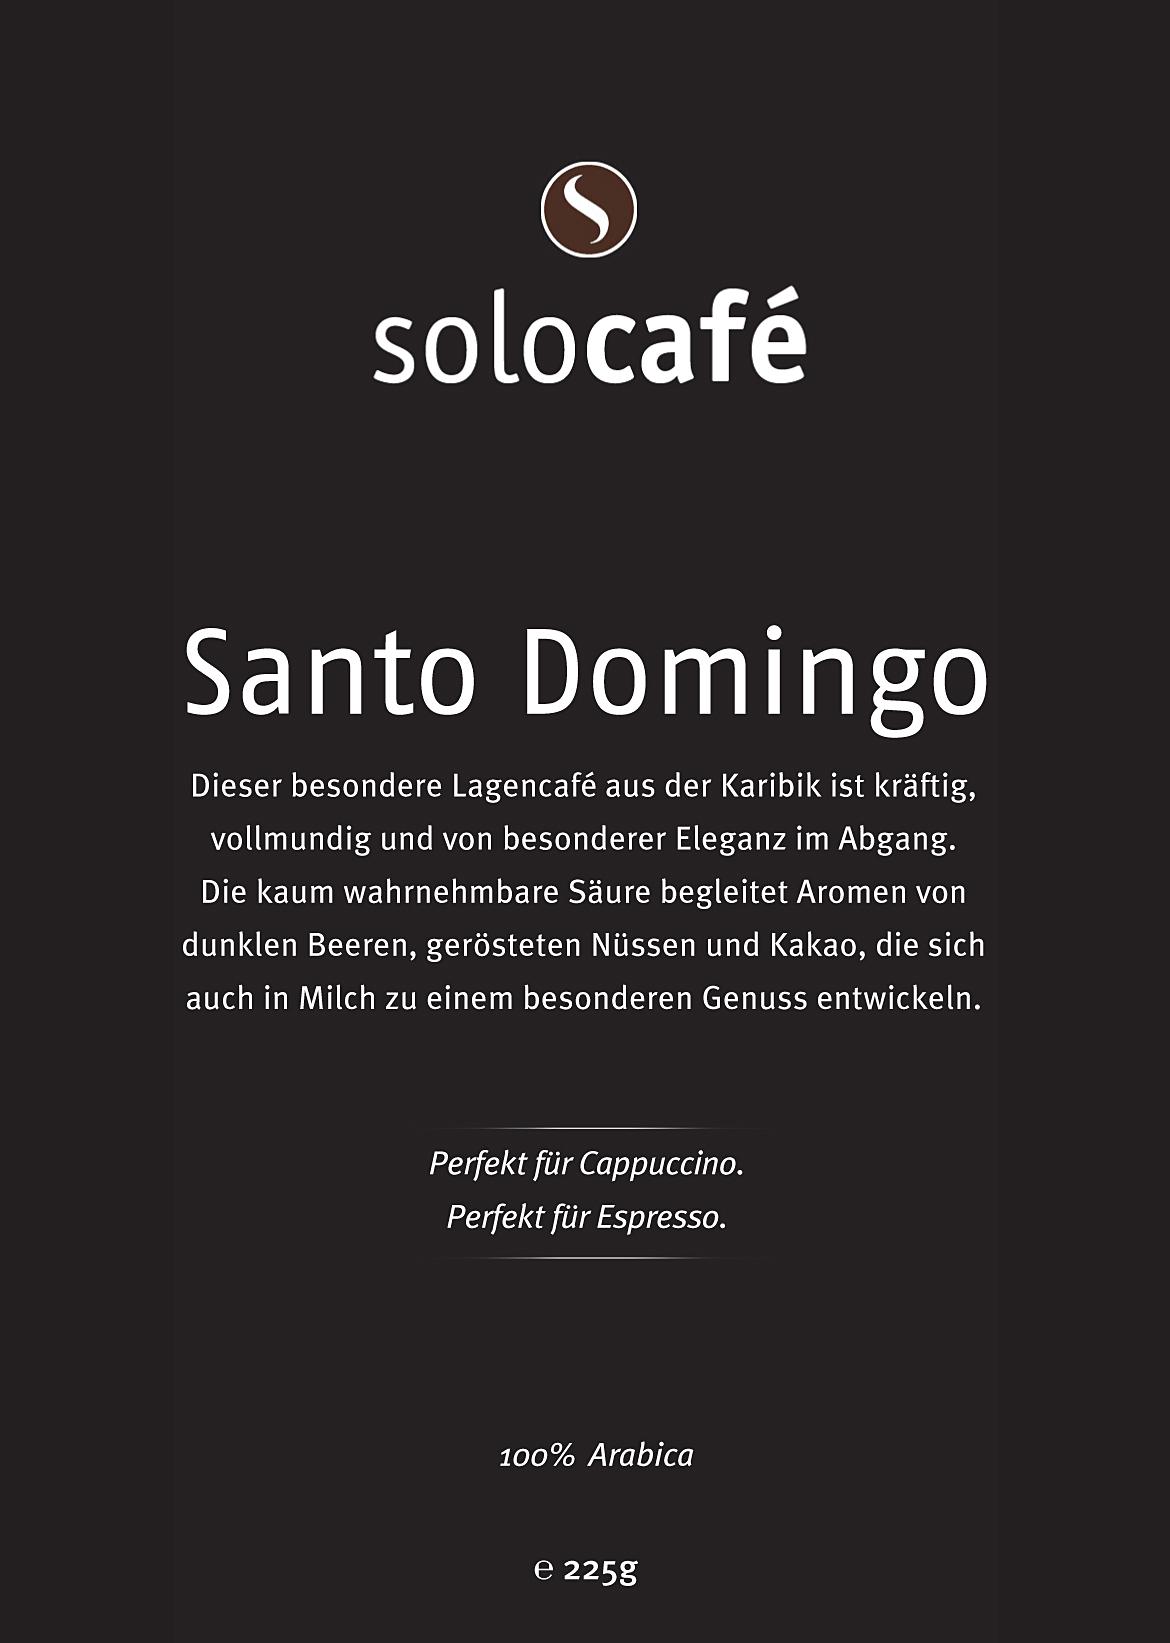 Microsoft Word - Santo Domingo_225